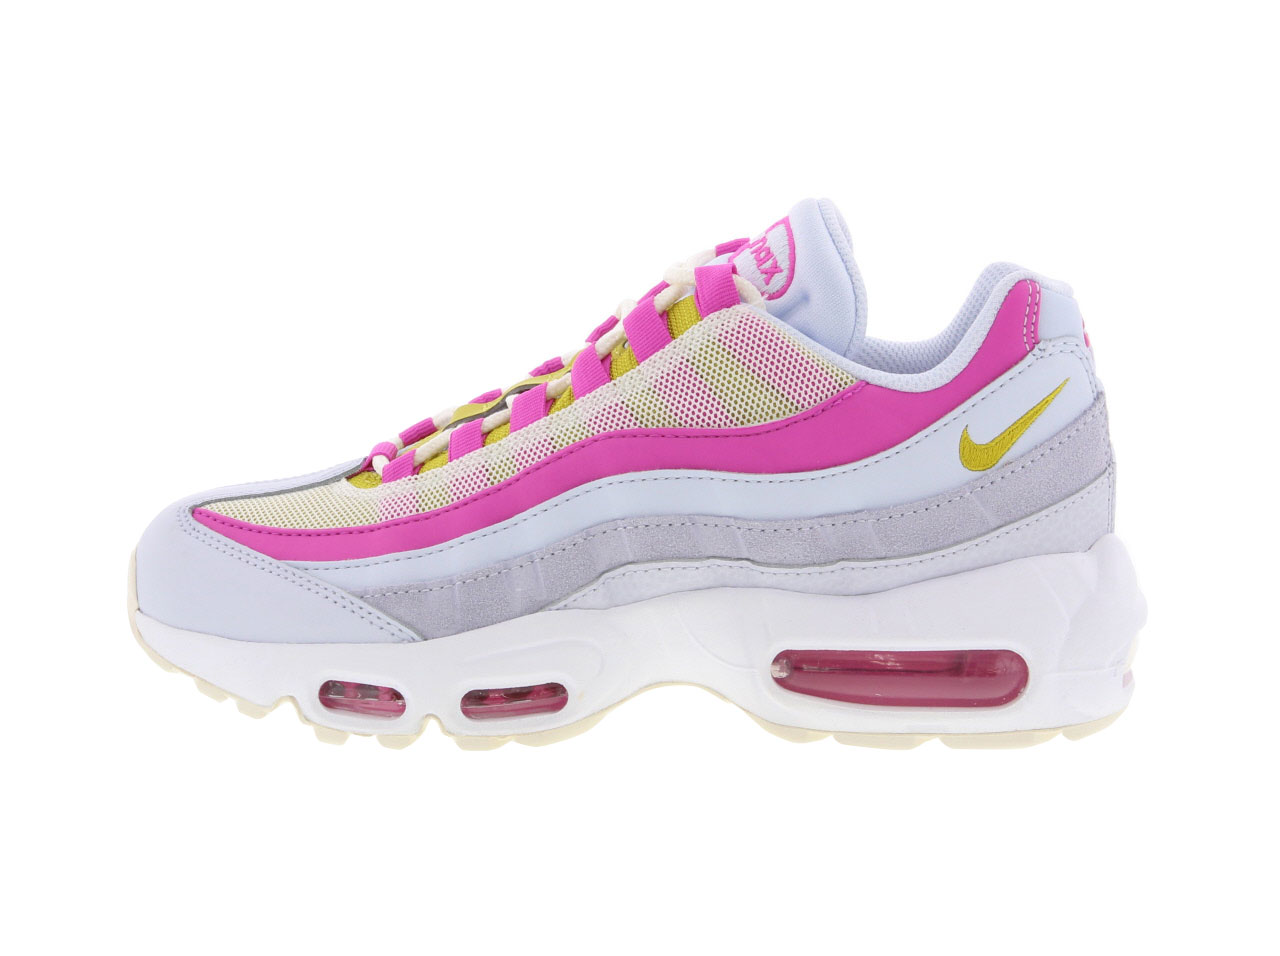 【20%OFF!】NIKE WOMENS AIR MAX 95(CI3710-001)【ナイキ】【レディースファッション】【シューズ】【スニーカー】【靴】【フットウェア】